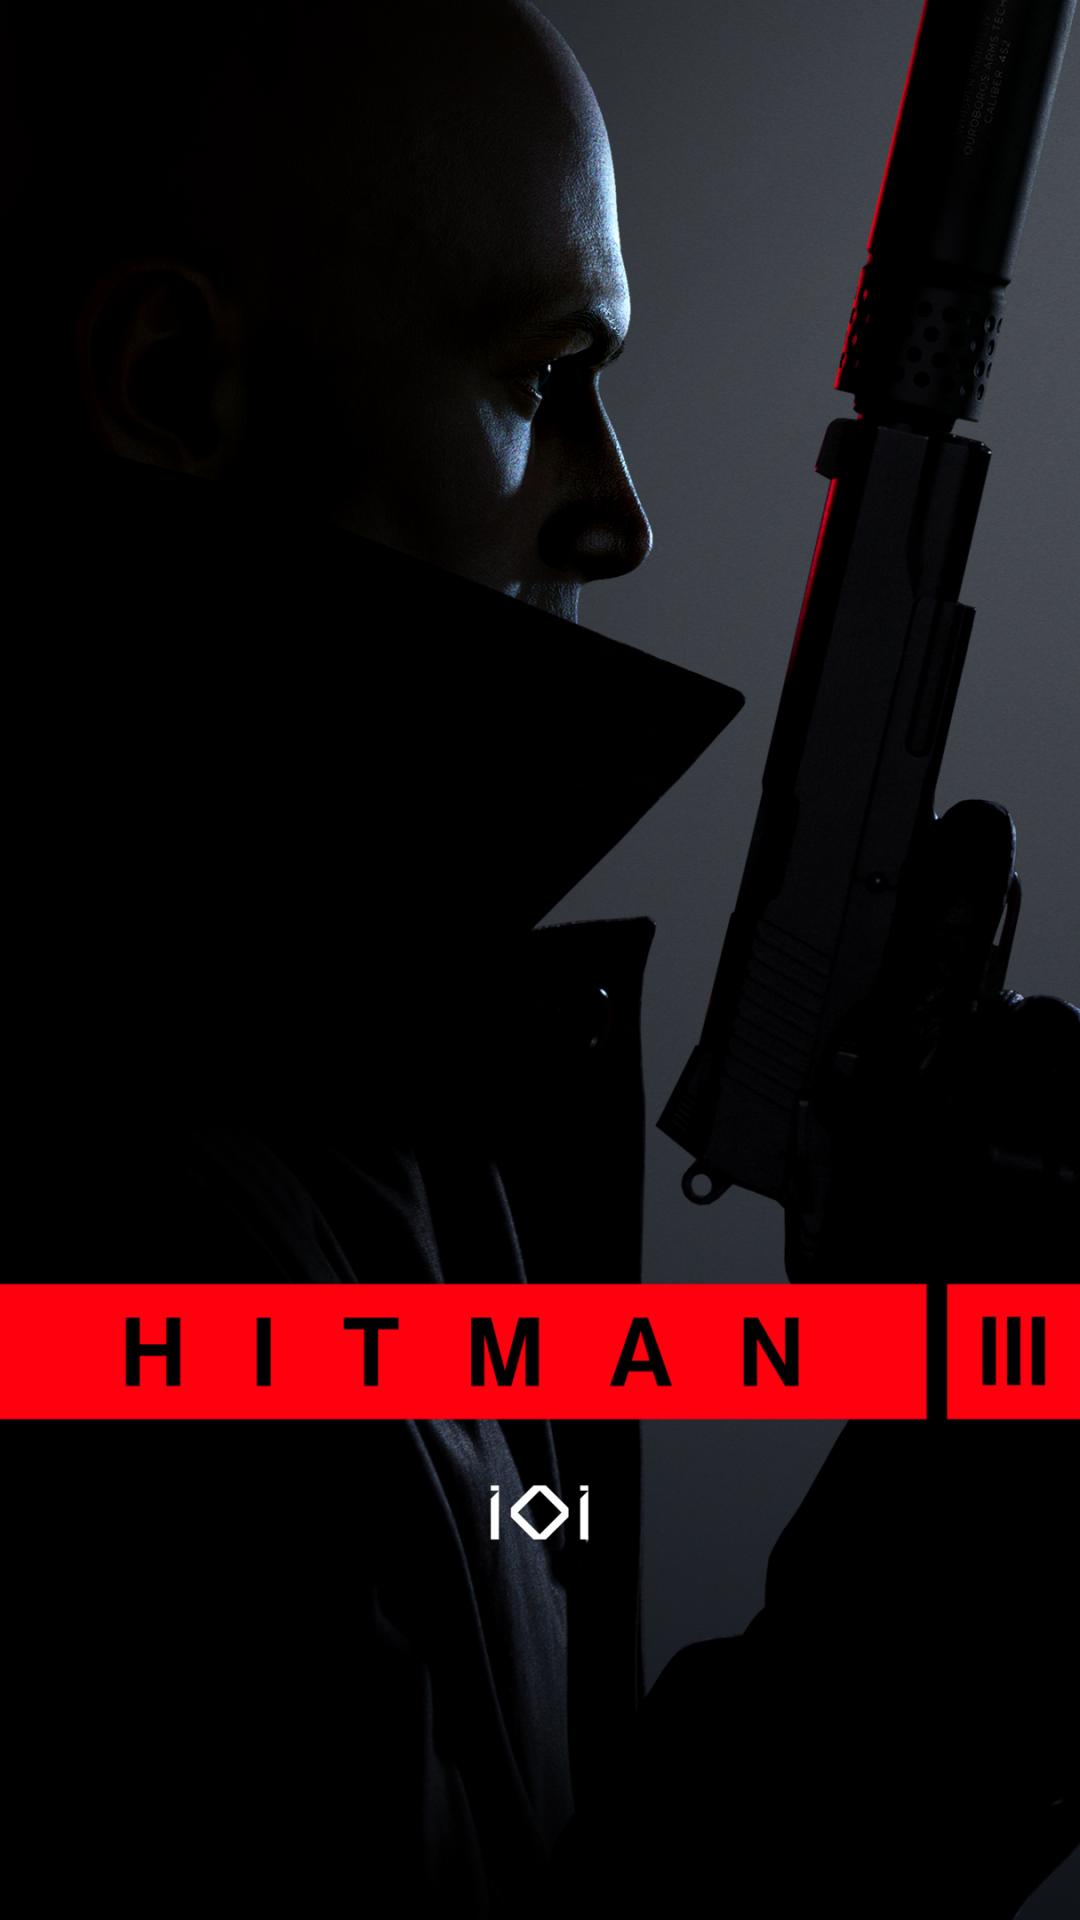 Hitman 3 4K Wallpaper, Agent 47, Xbox One X, PlayStation 5, 2020 Games, Black/Dark, #1277